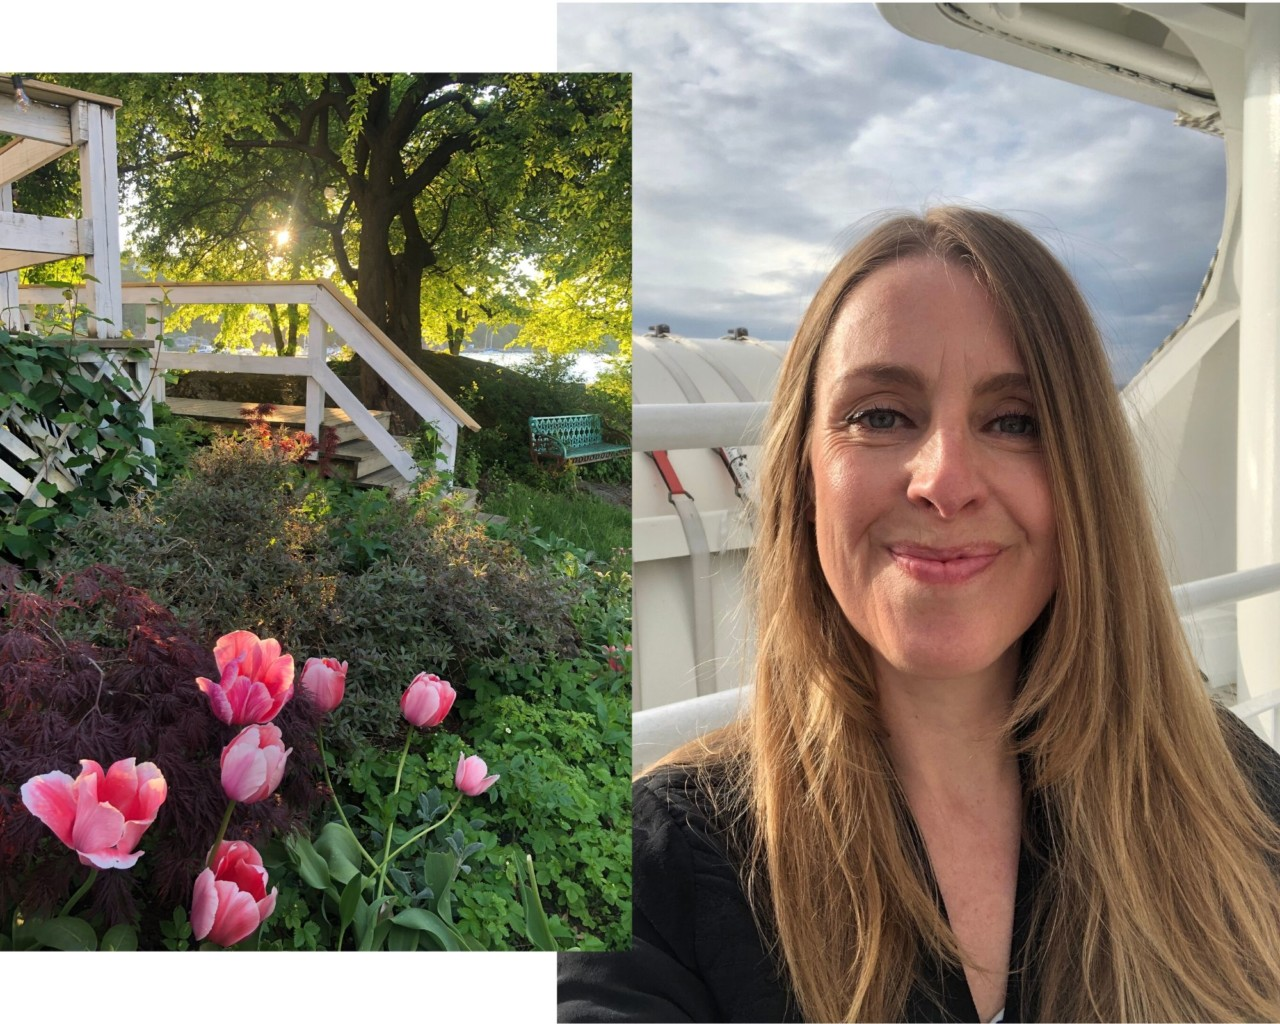 anja-stang-hellviktangen-kunstkafe-solnedgang-blomster-nesoddbaten